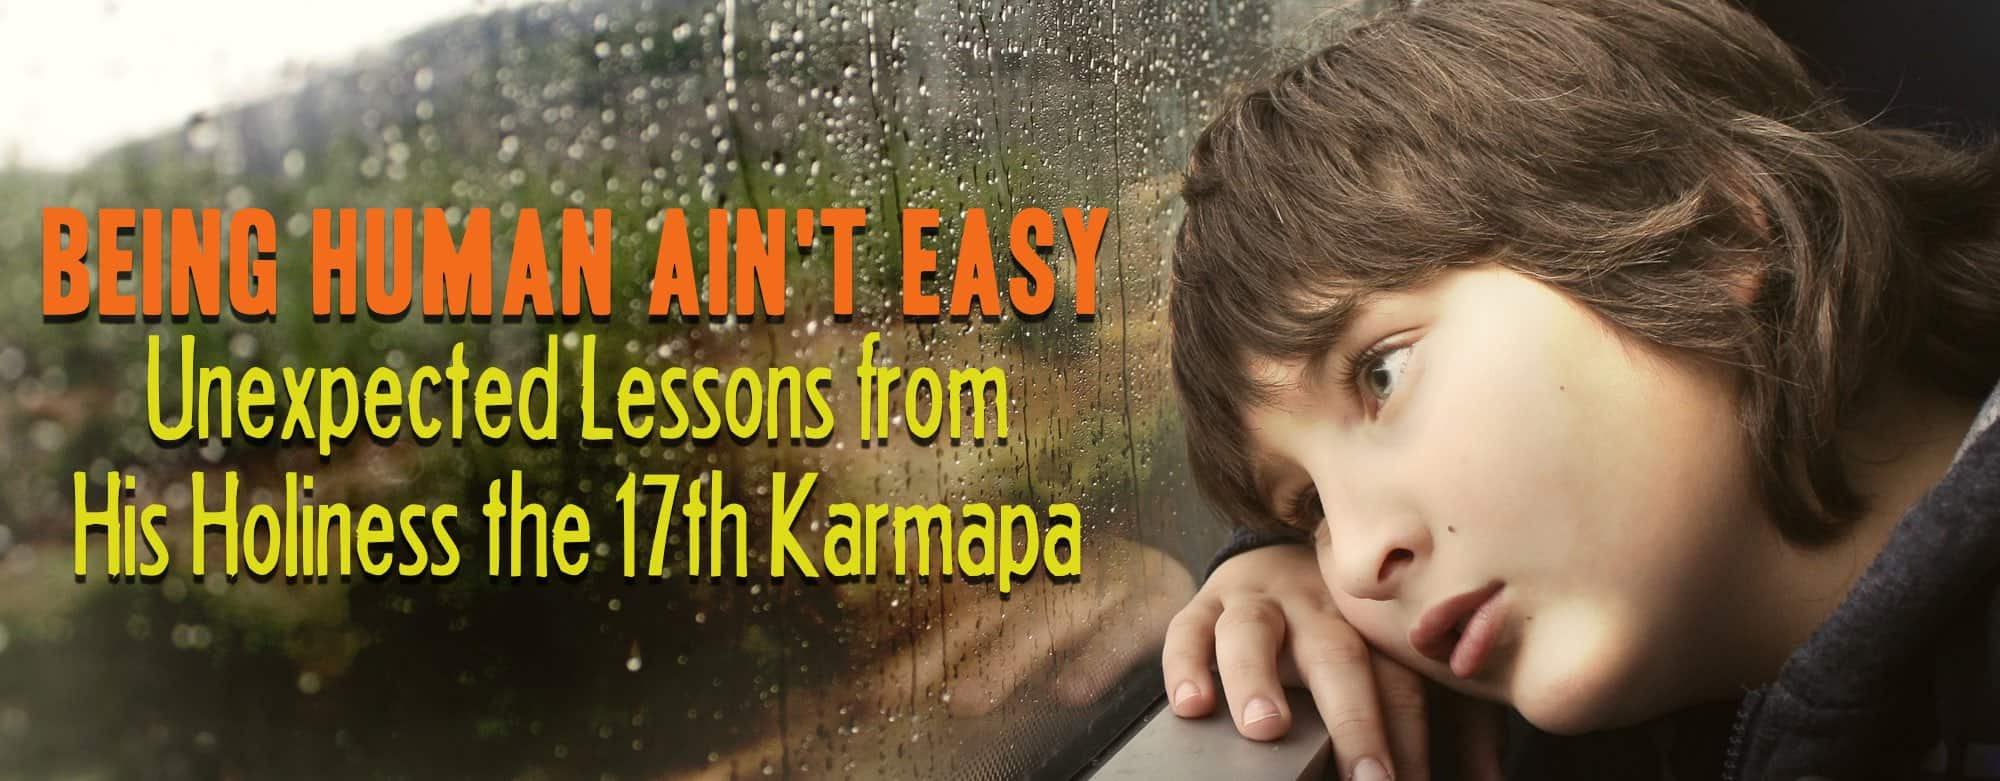 Karmapa Article Header Lower Px